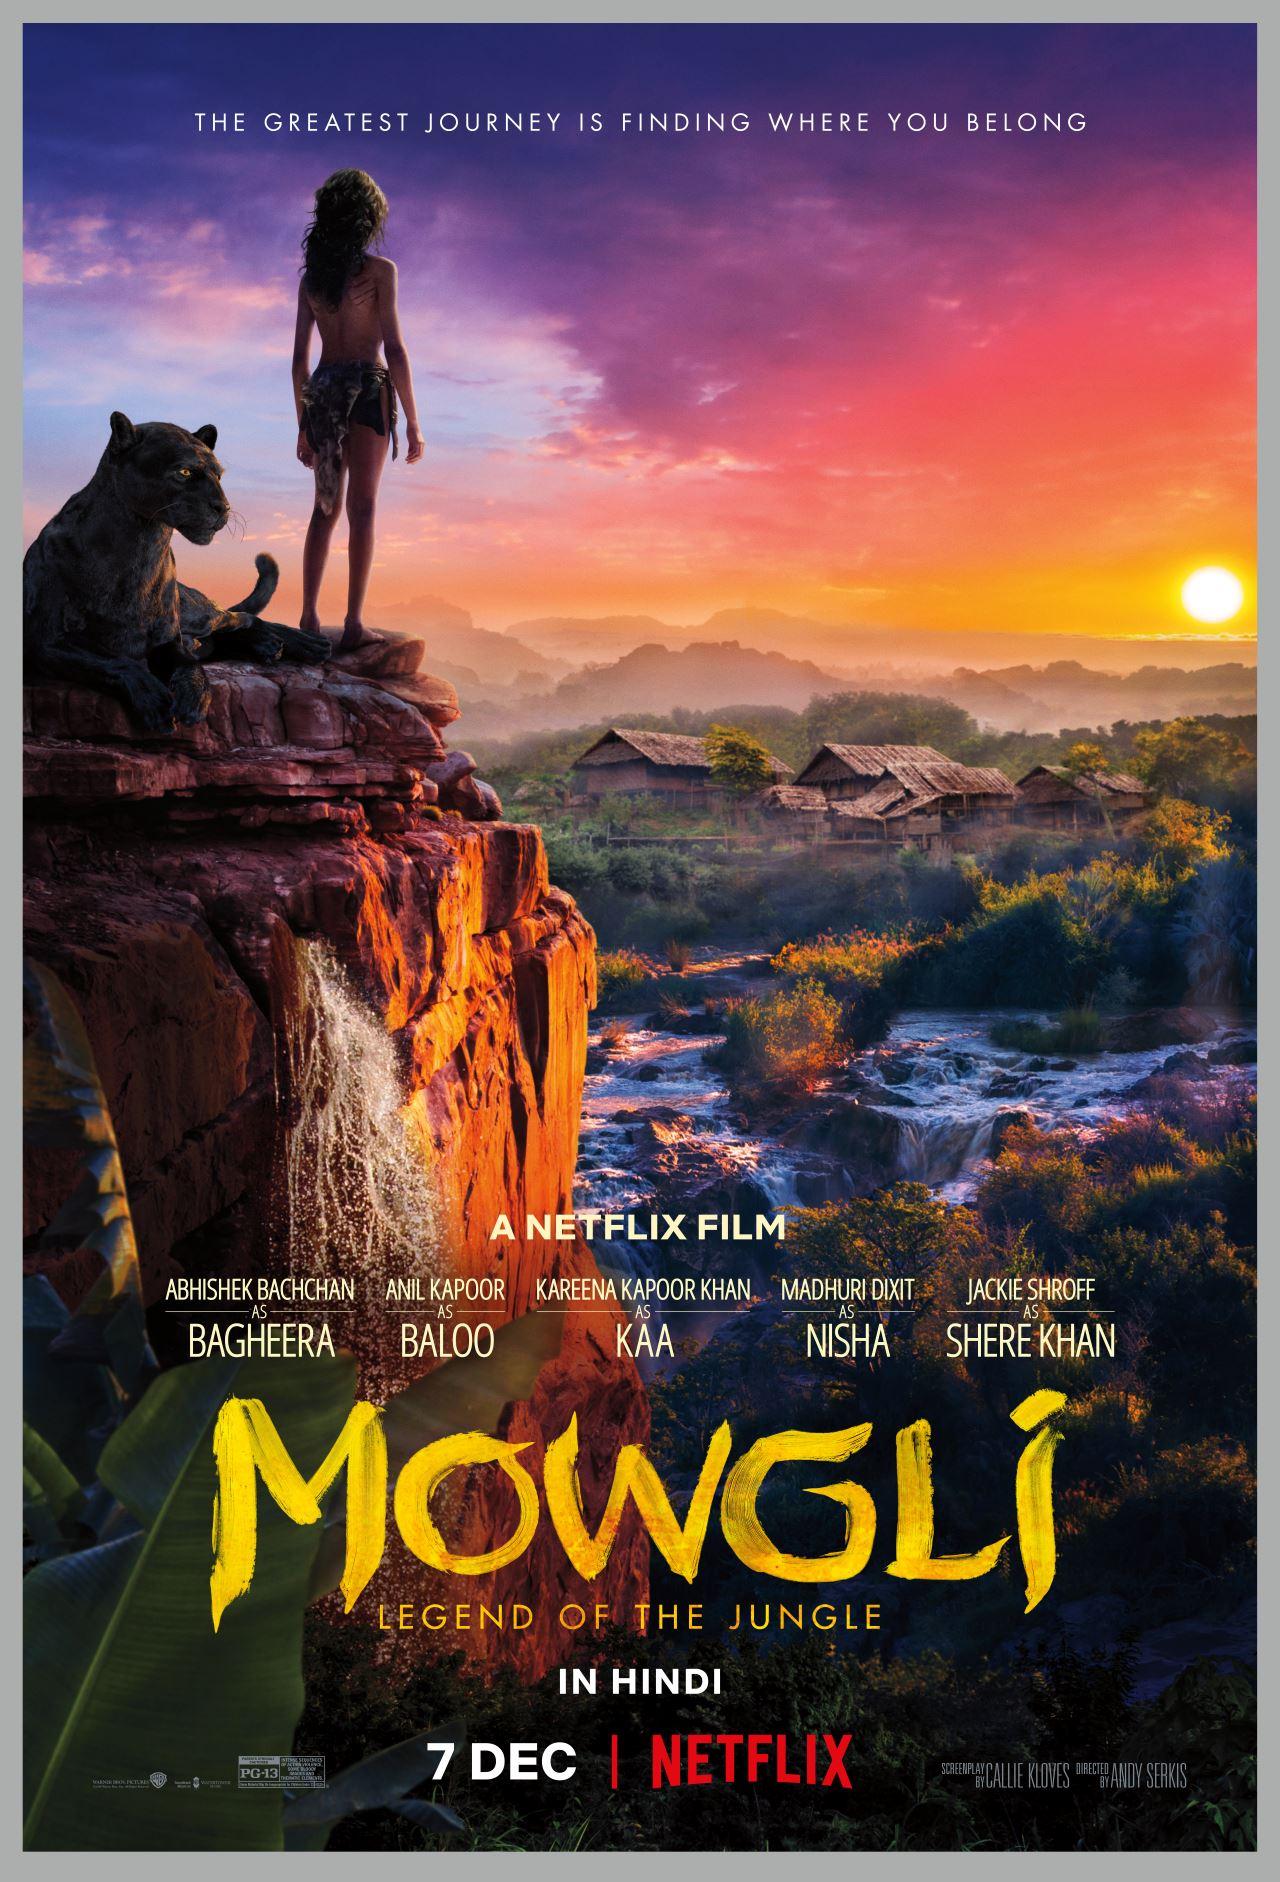 Netflix's Mowgli Casts Abhishek Bachchan, Kareena Kapoor, and More